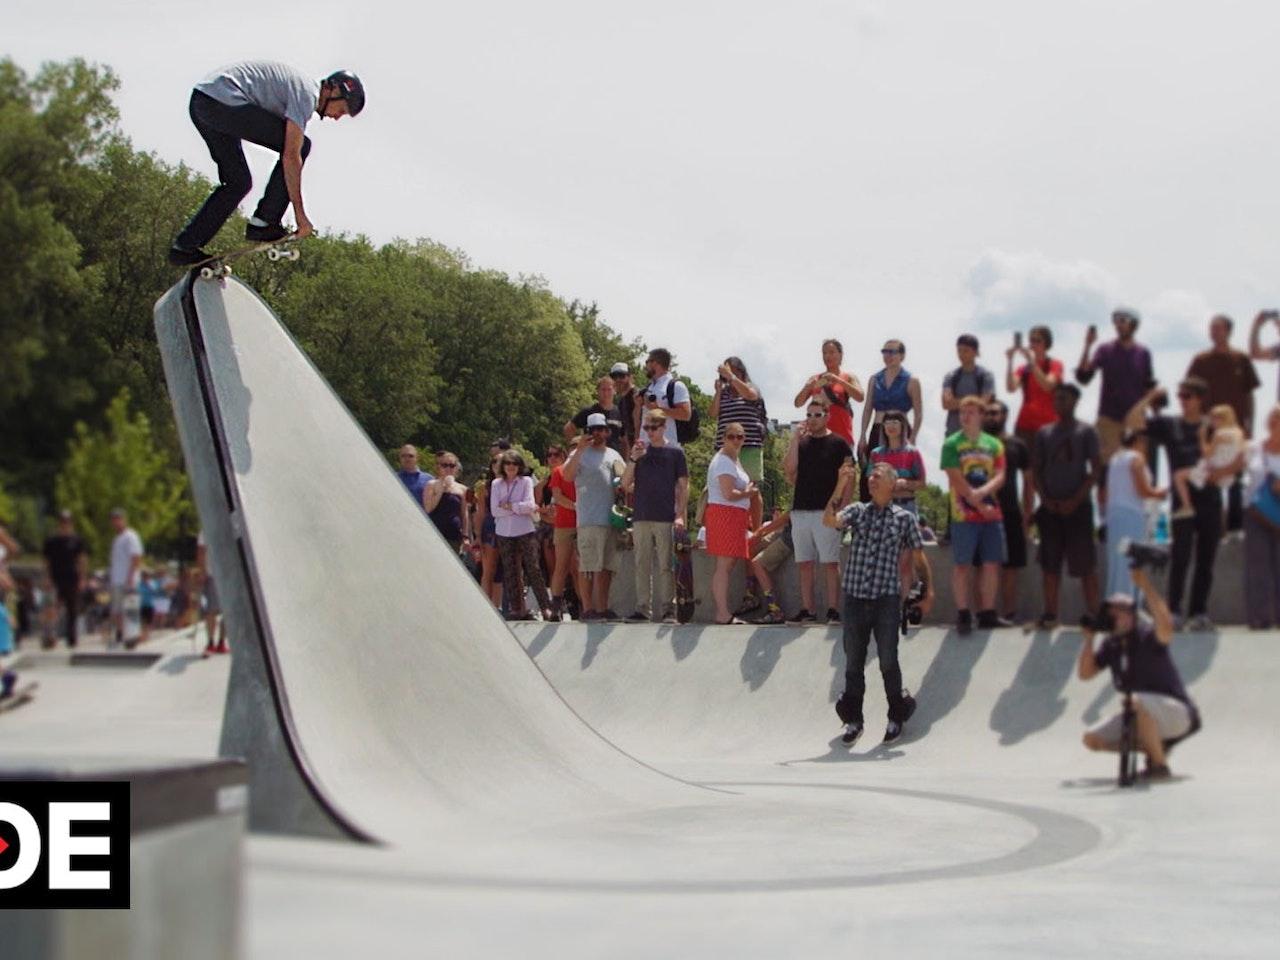 Tony Hawk Celebrates Burlington's A-Dog Skatepark With Surprise Visit